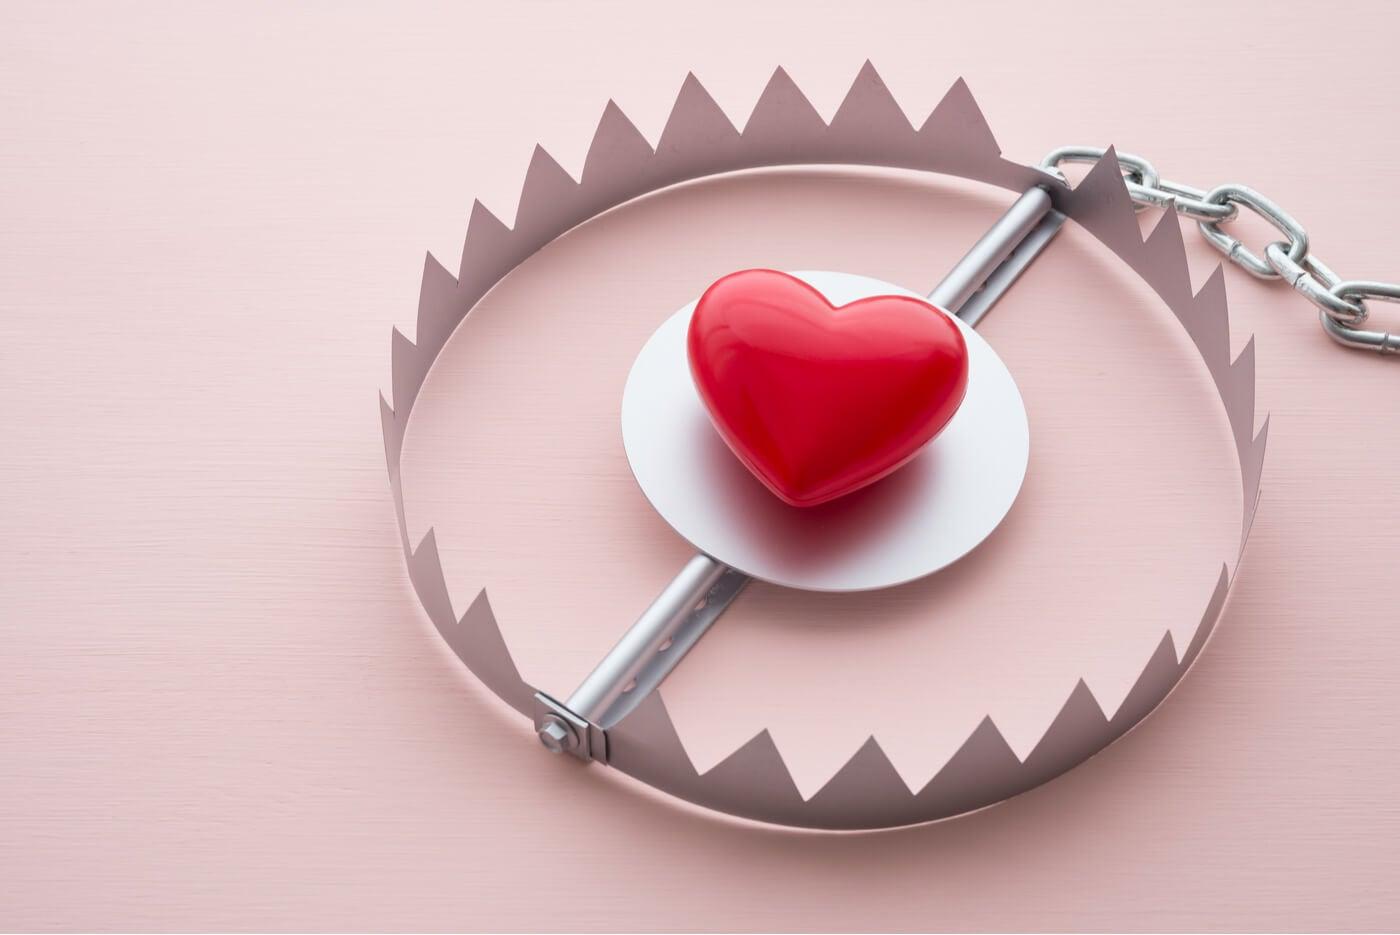 corazon trampa